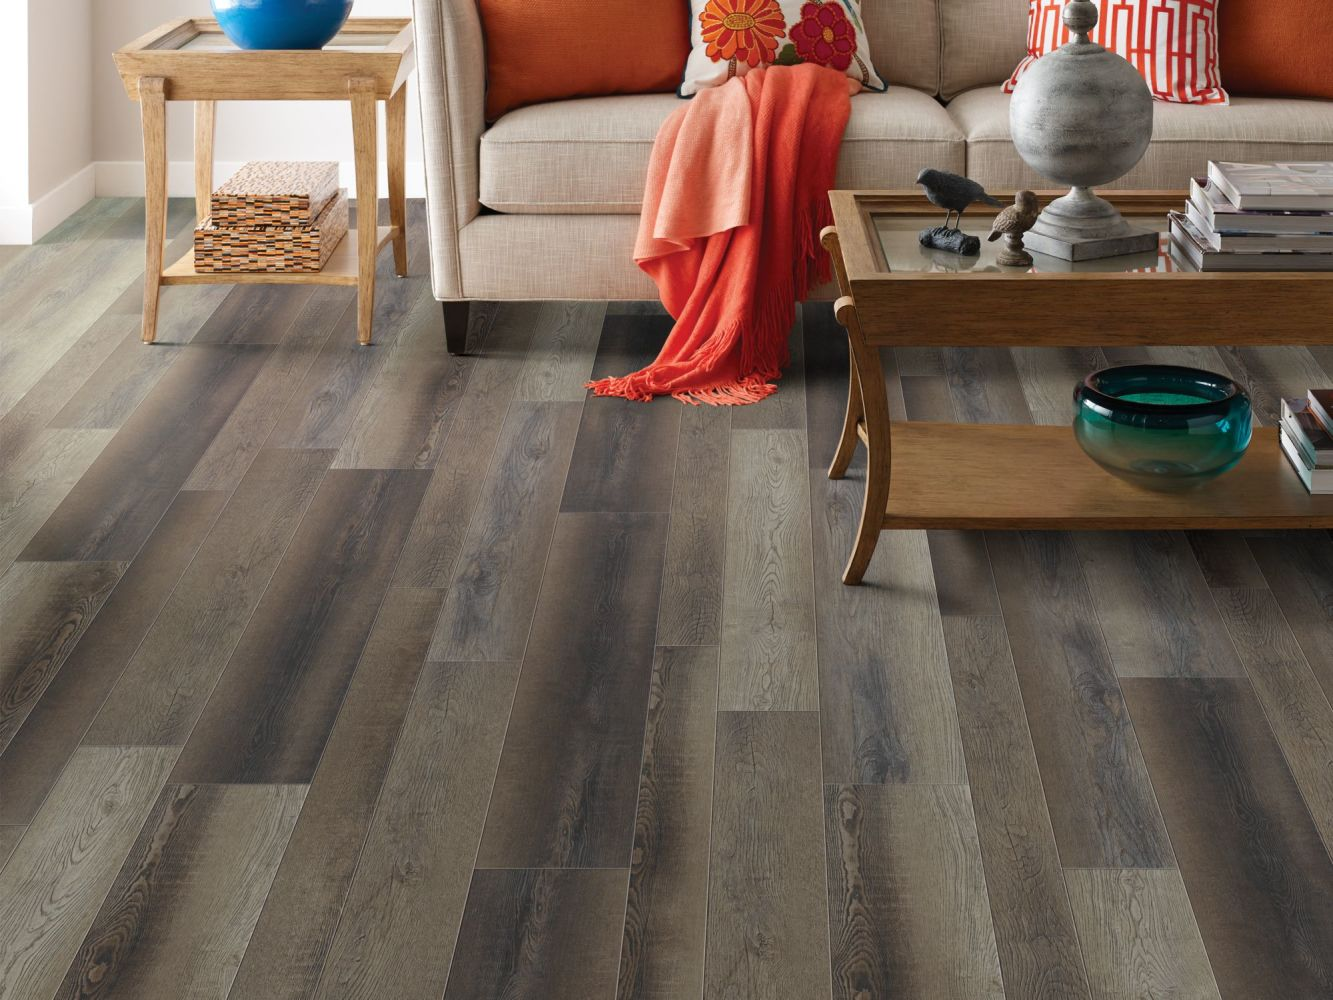 Shaw Floors Reality Homes Fremont Mixed Blackfill Oak 00909_108RH